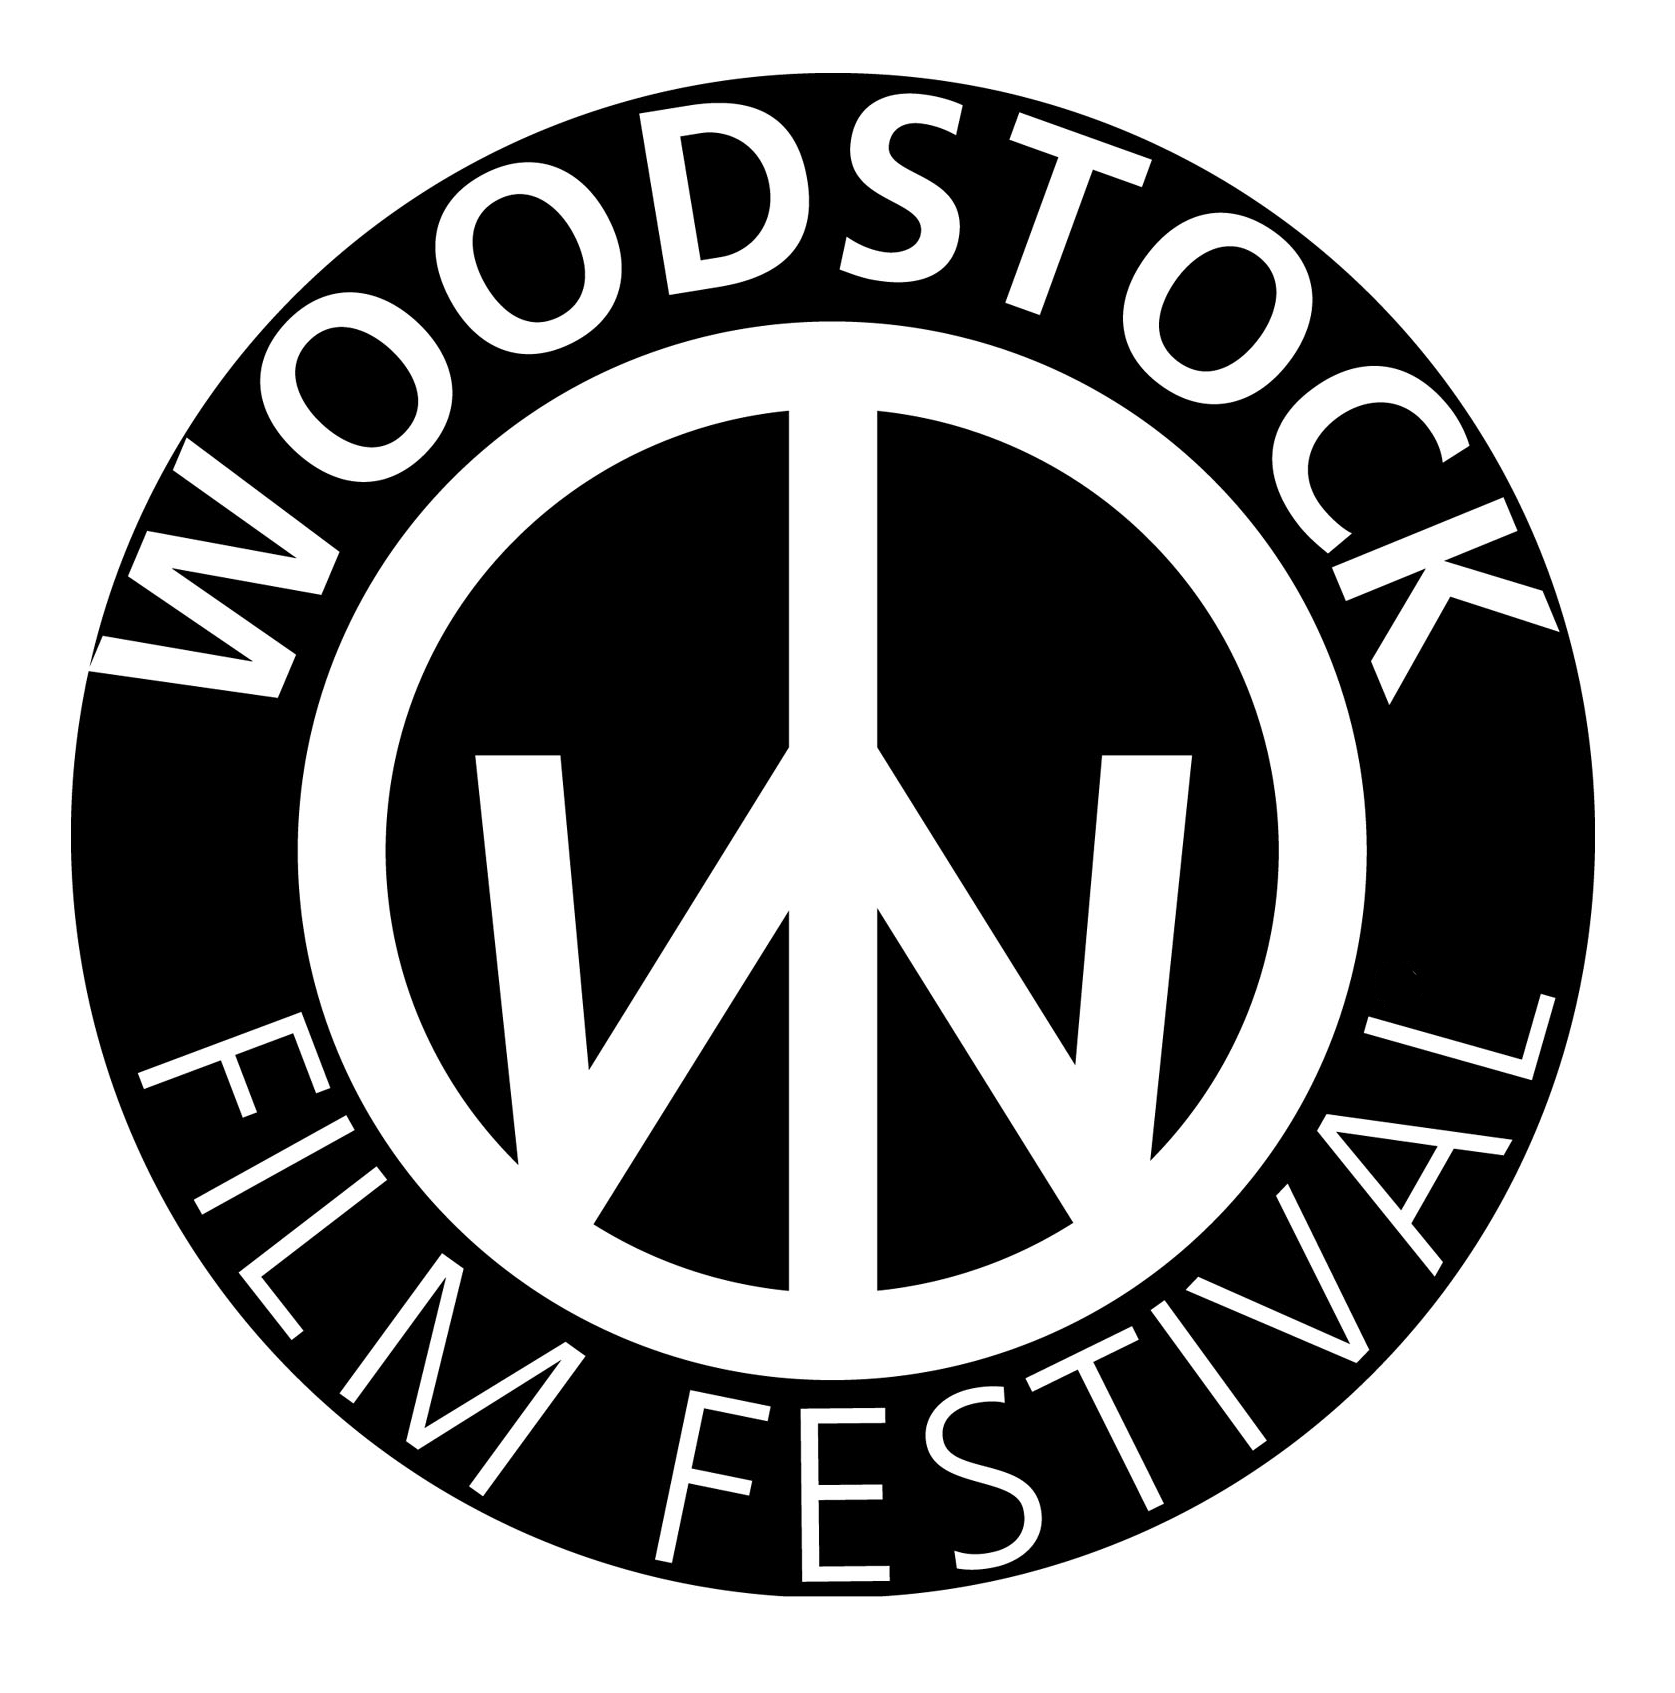 Woodstock Film Festival, Inc.